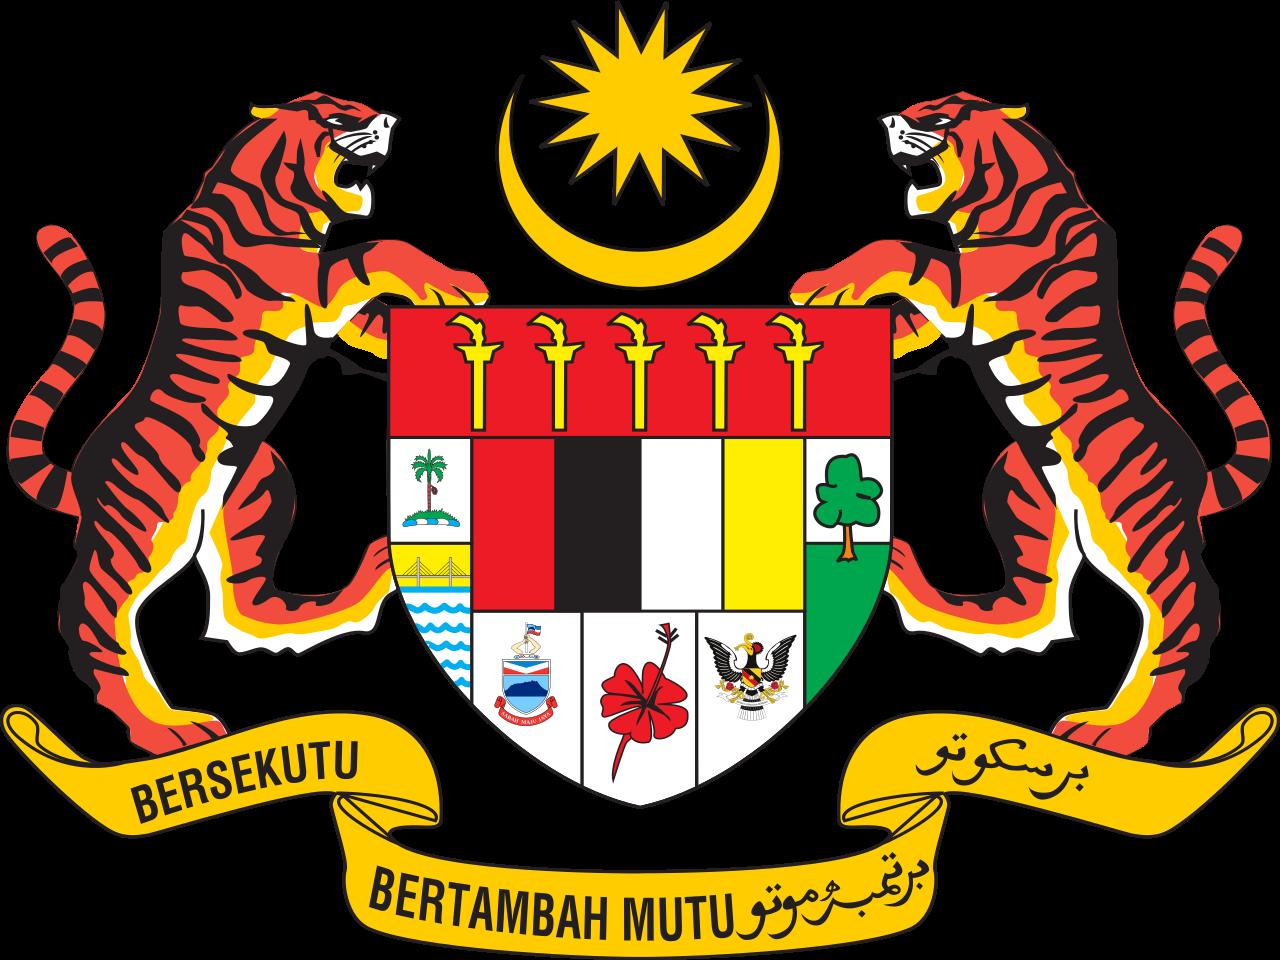 [url=https://flic.kr/p/Laamp1][img]https://farm2.staticflickr.com/1749/28983370878_6182b33731_o.png[/img][/url][url=https://flic.kr/p/Laamp1]1280px-Coat_of_arms_of_Malaysia.svg[/url] by [url=https://www.flickr.com/photos/am-jochim/]Mark Jochim[/url], on Flickr